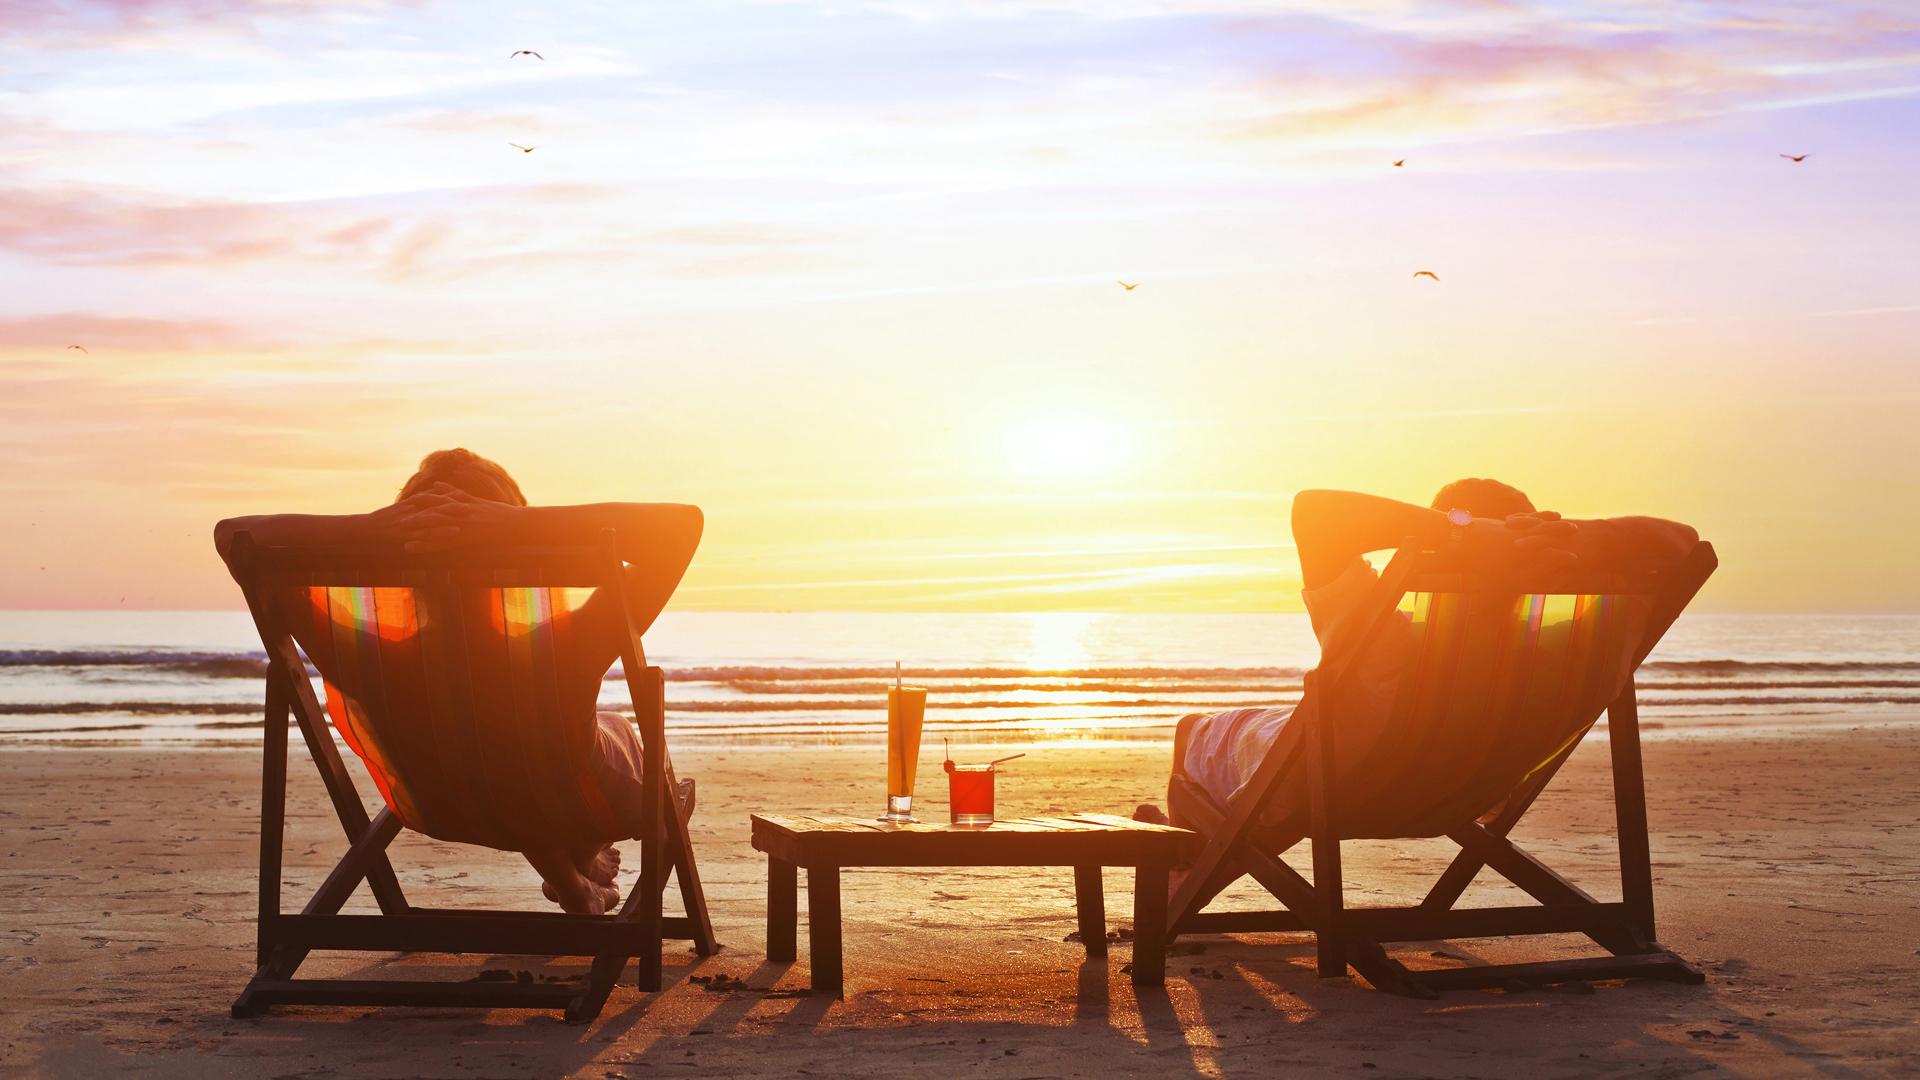 happy couple enjoy luxury sunset on the beach during summer vaca